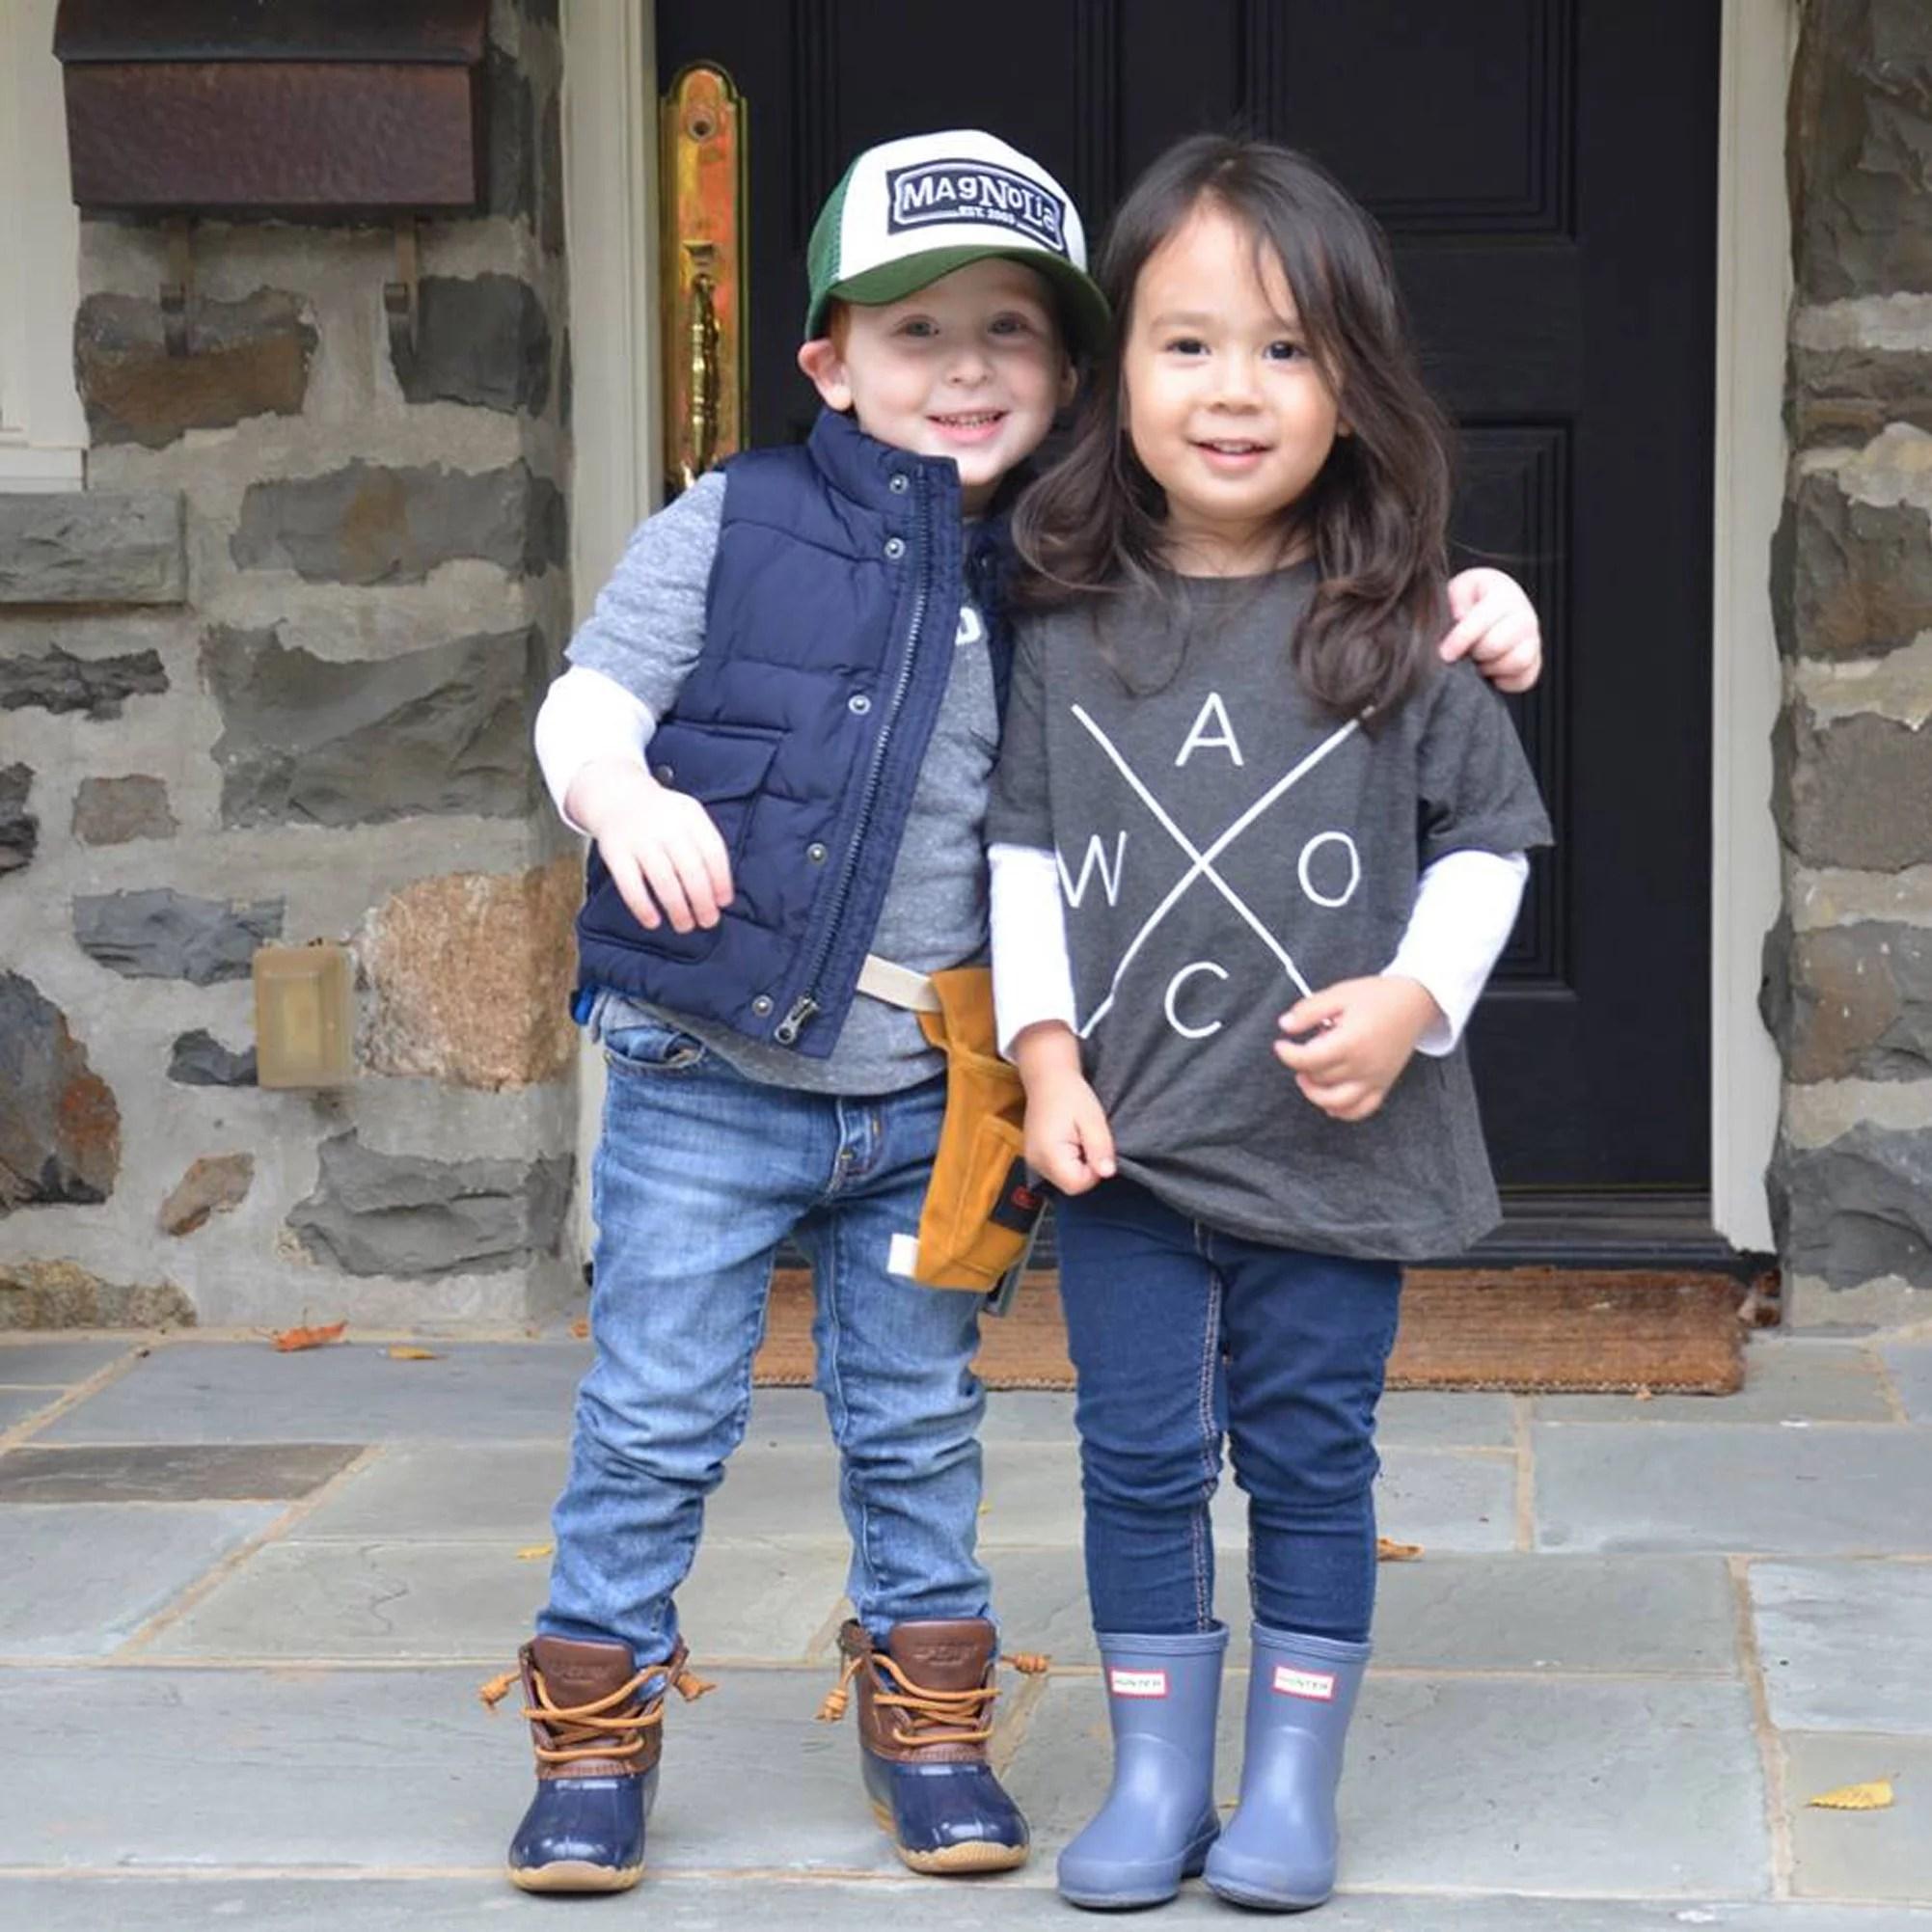 Fullsize Of Joanna Gaines Kids